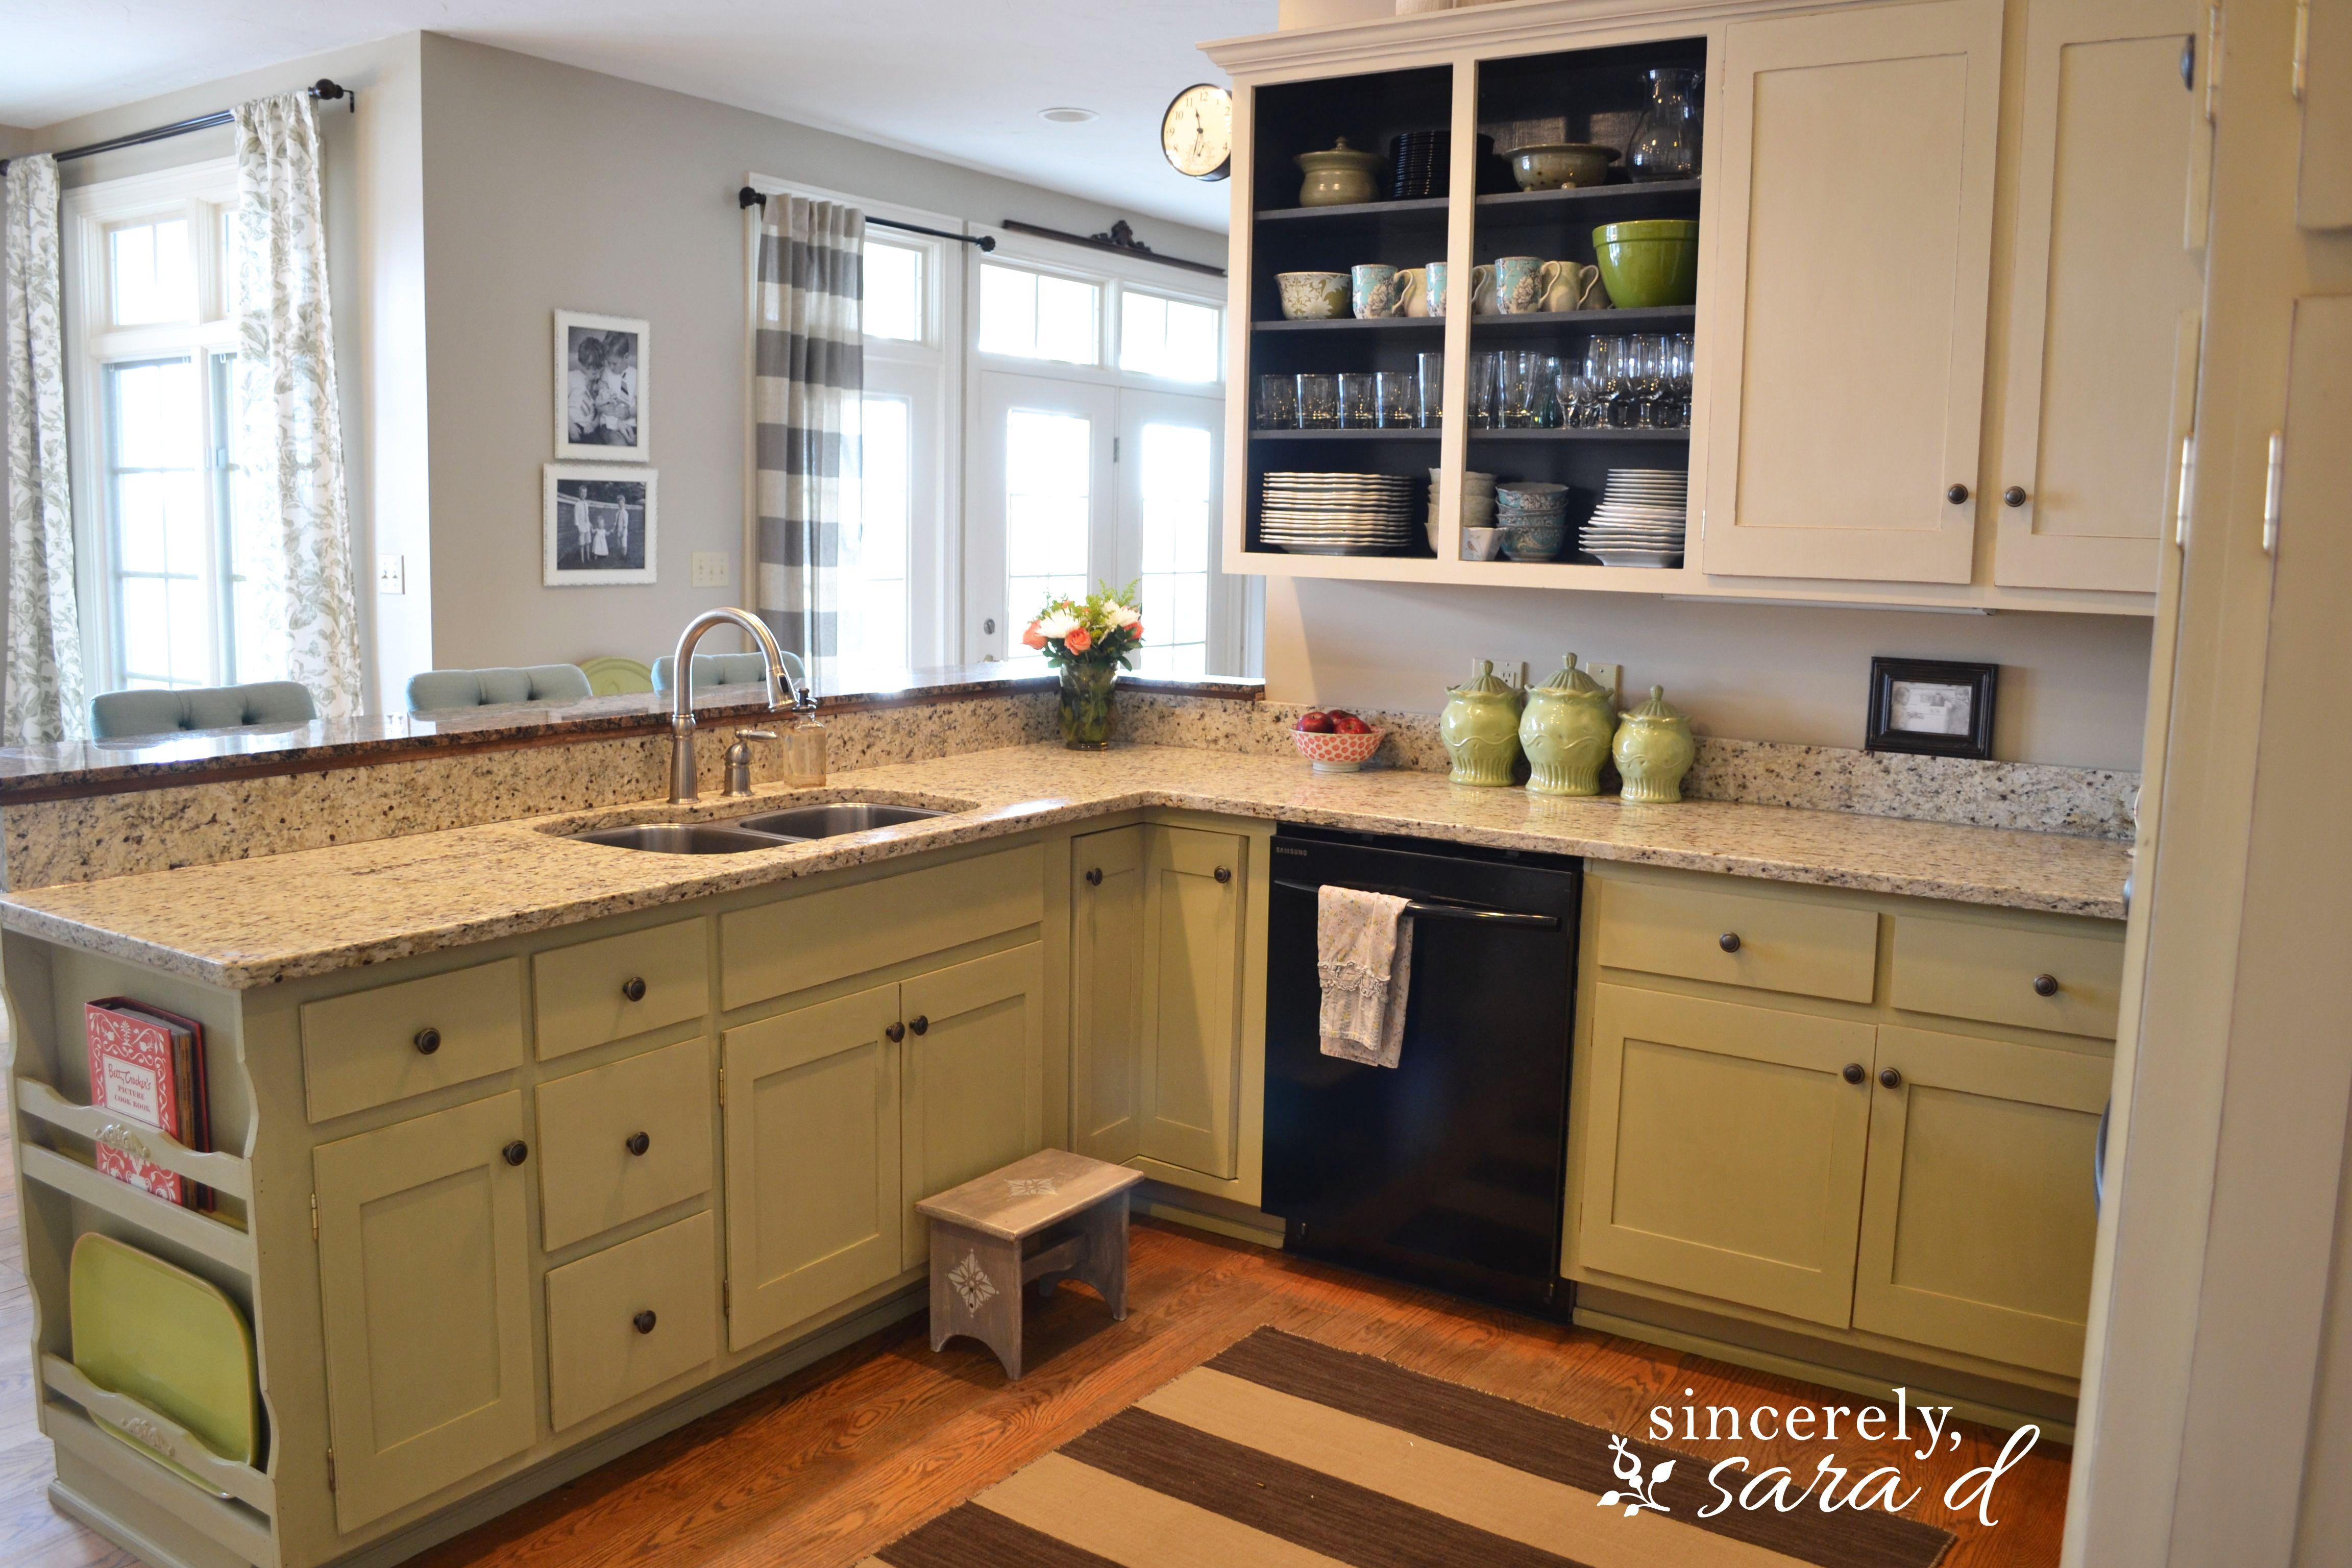 Kitchen Cabinet Color   Sincerely, Sara D.   Home Decor & DIY ...